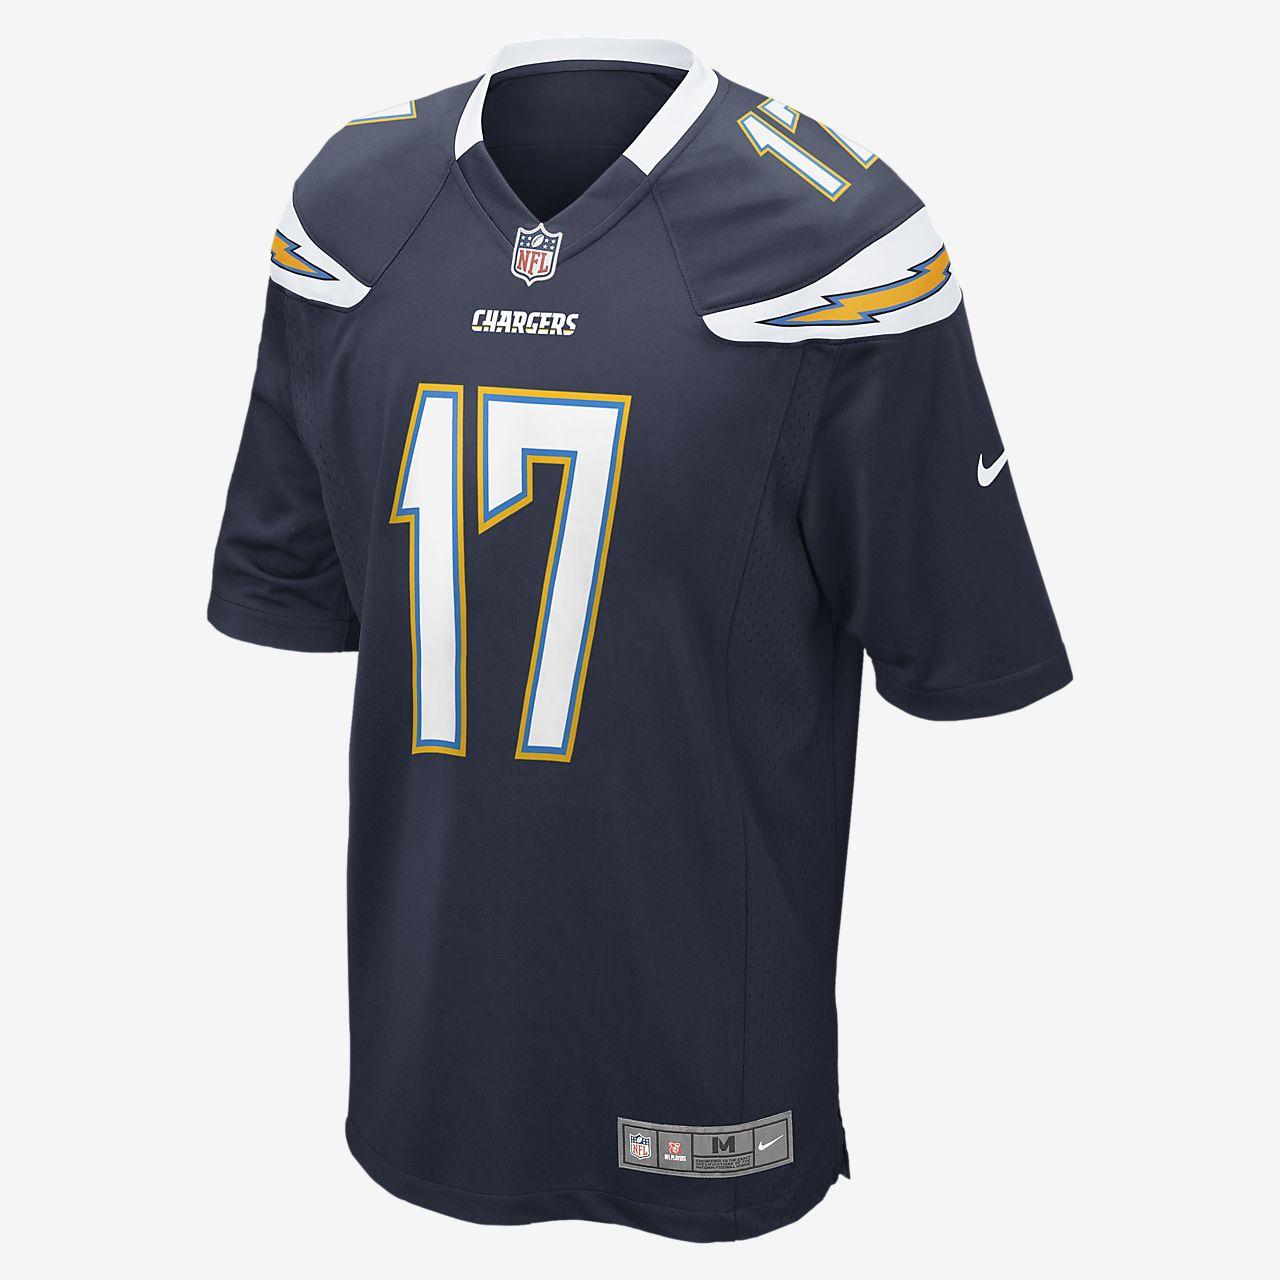 Maglia da football americano NFL Los Angeles Chargers (Philip Rivers) Home Game - Uomo